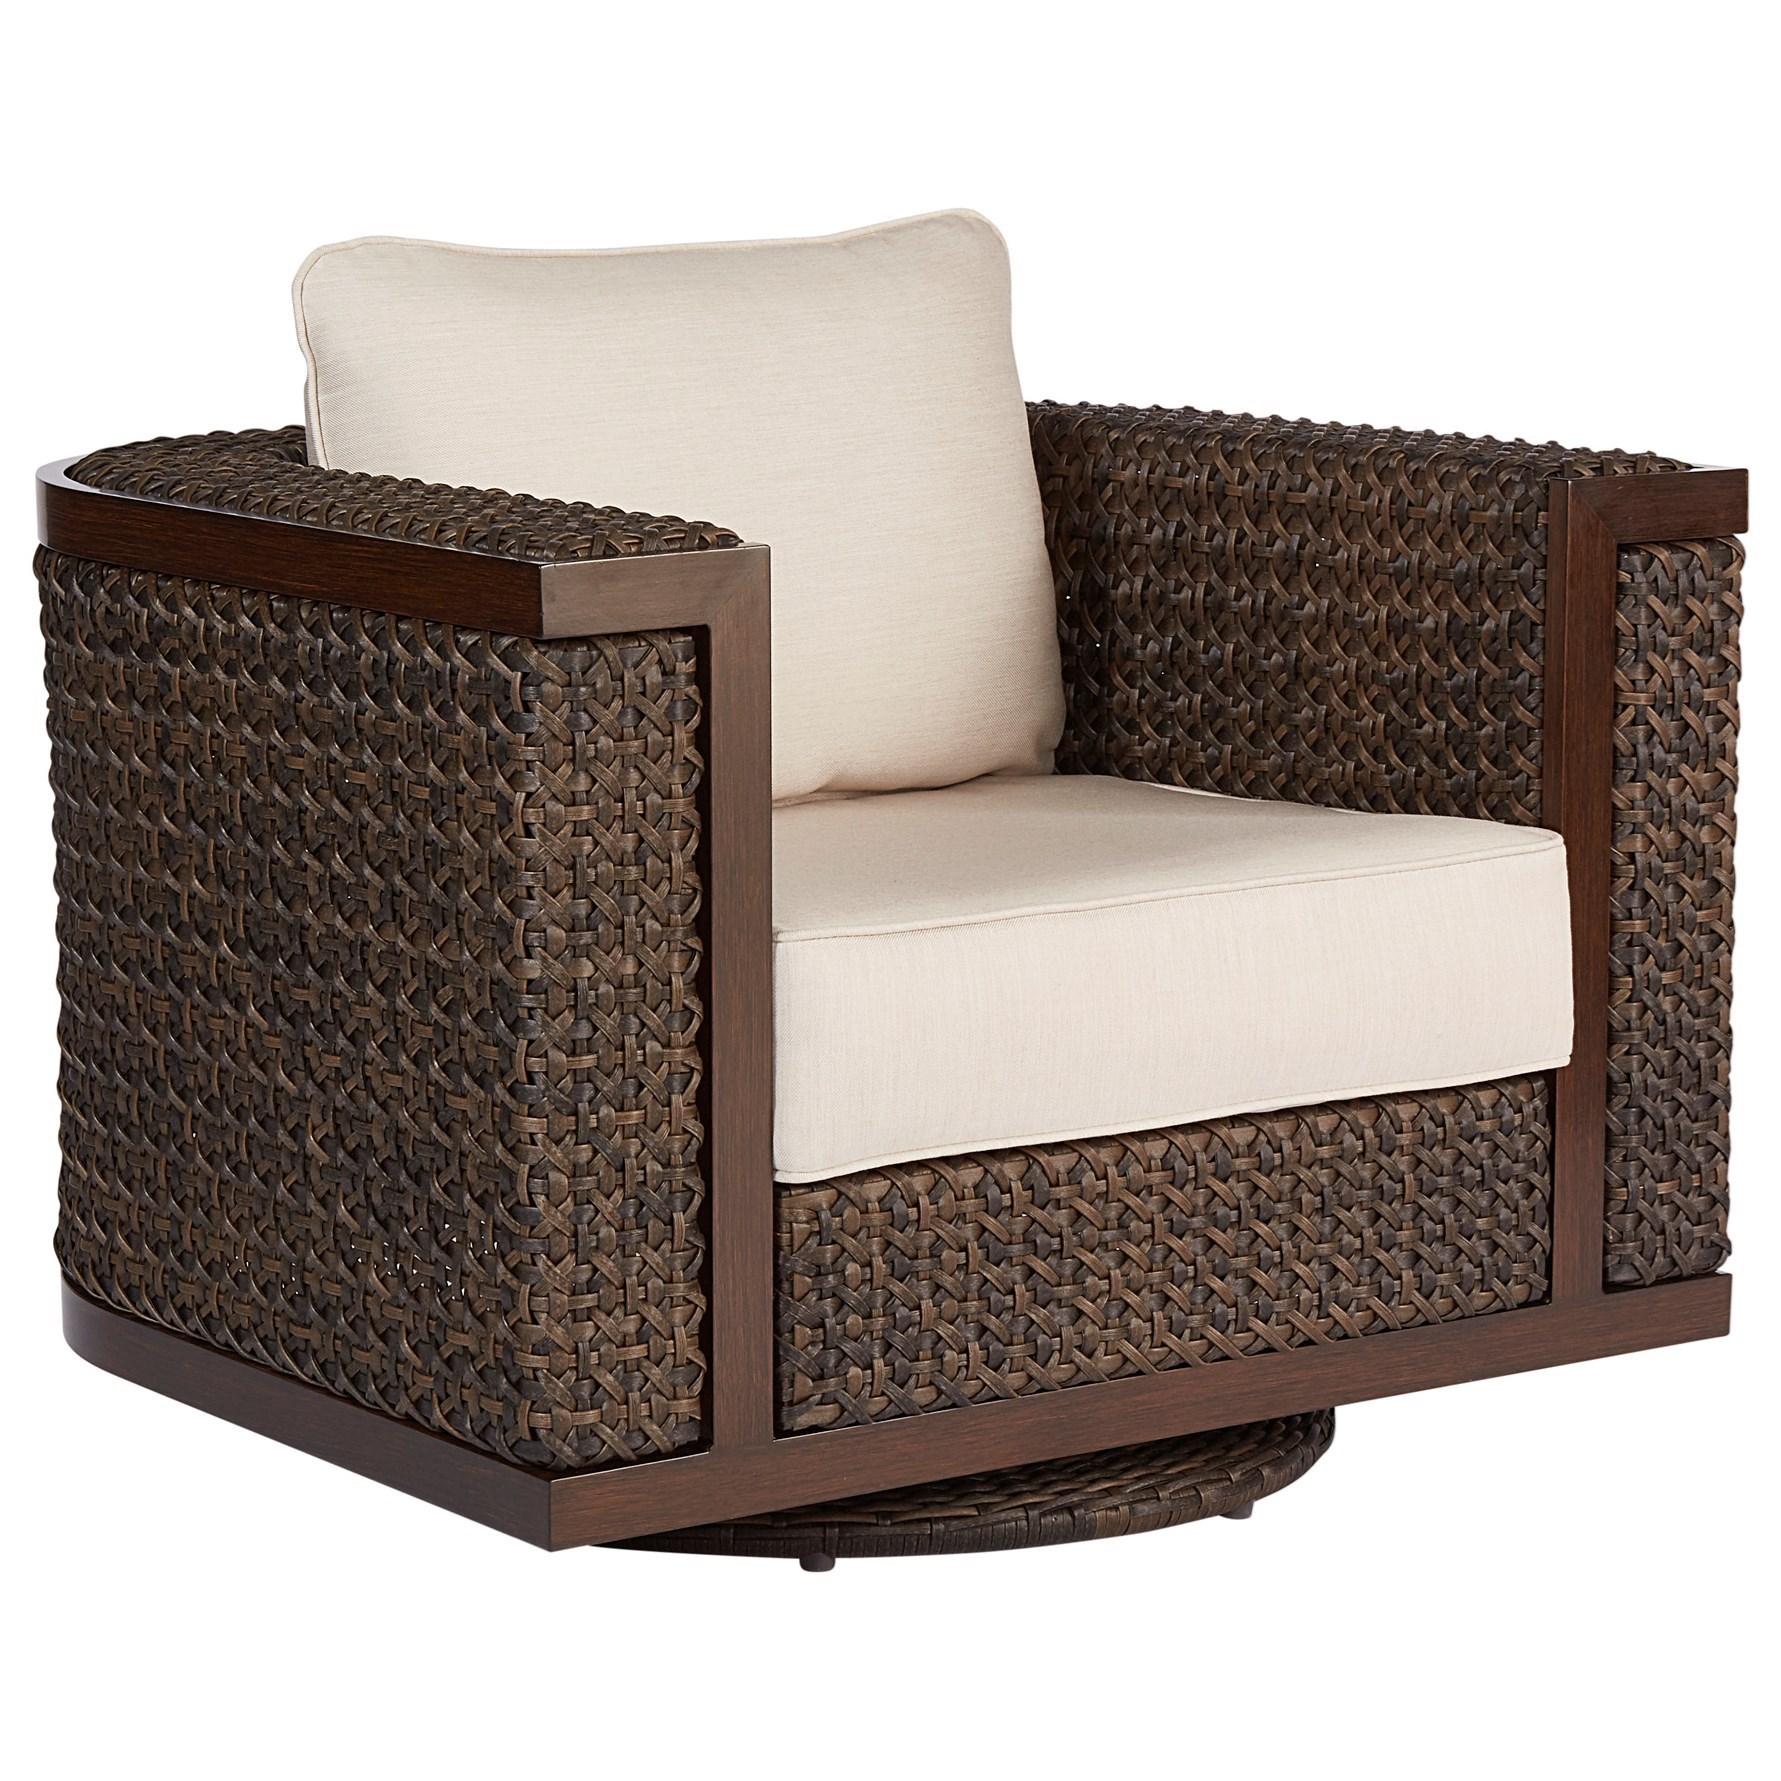 Wicker Swivel Rocking Club Chair